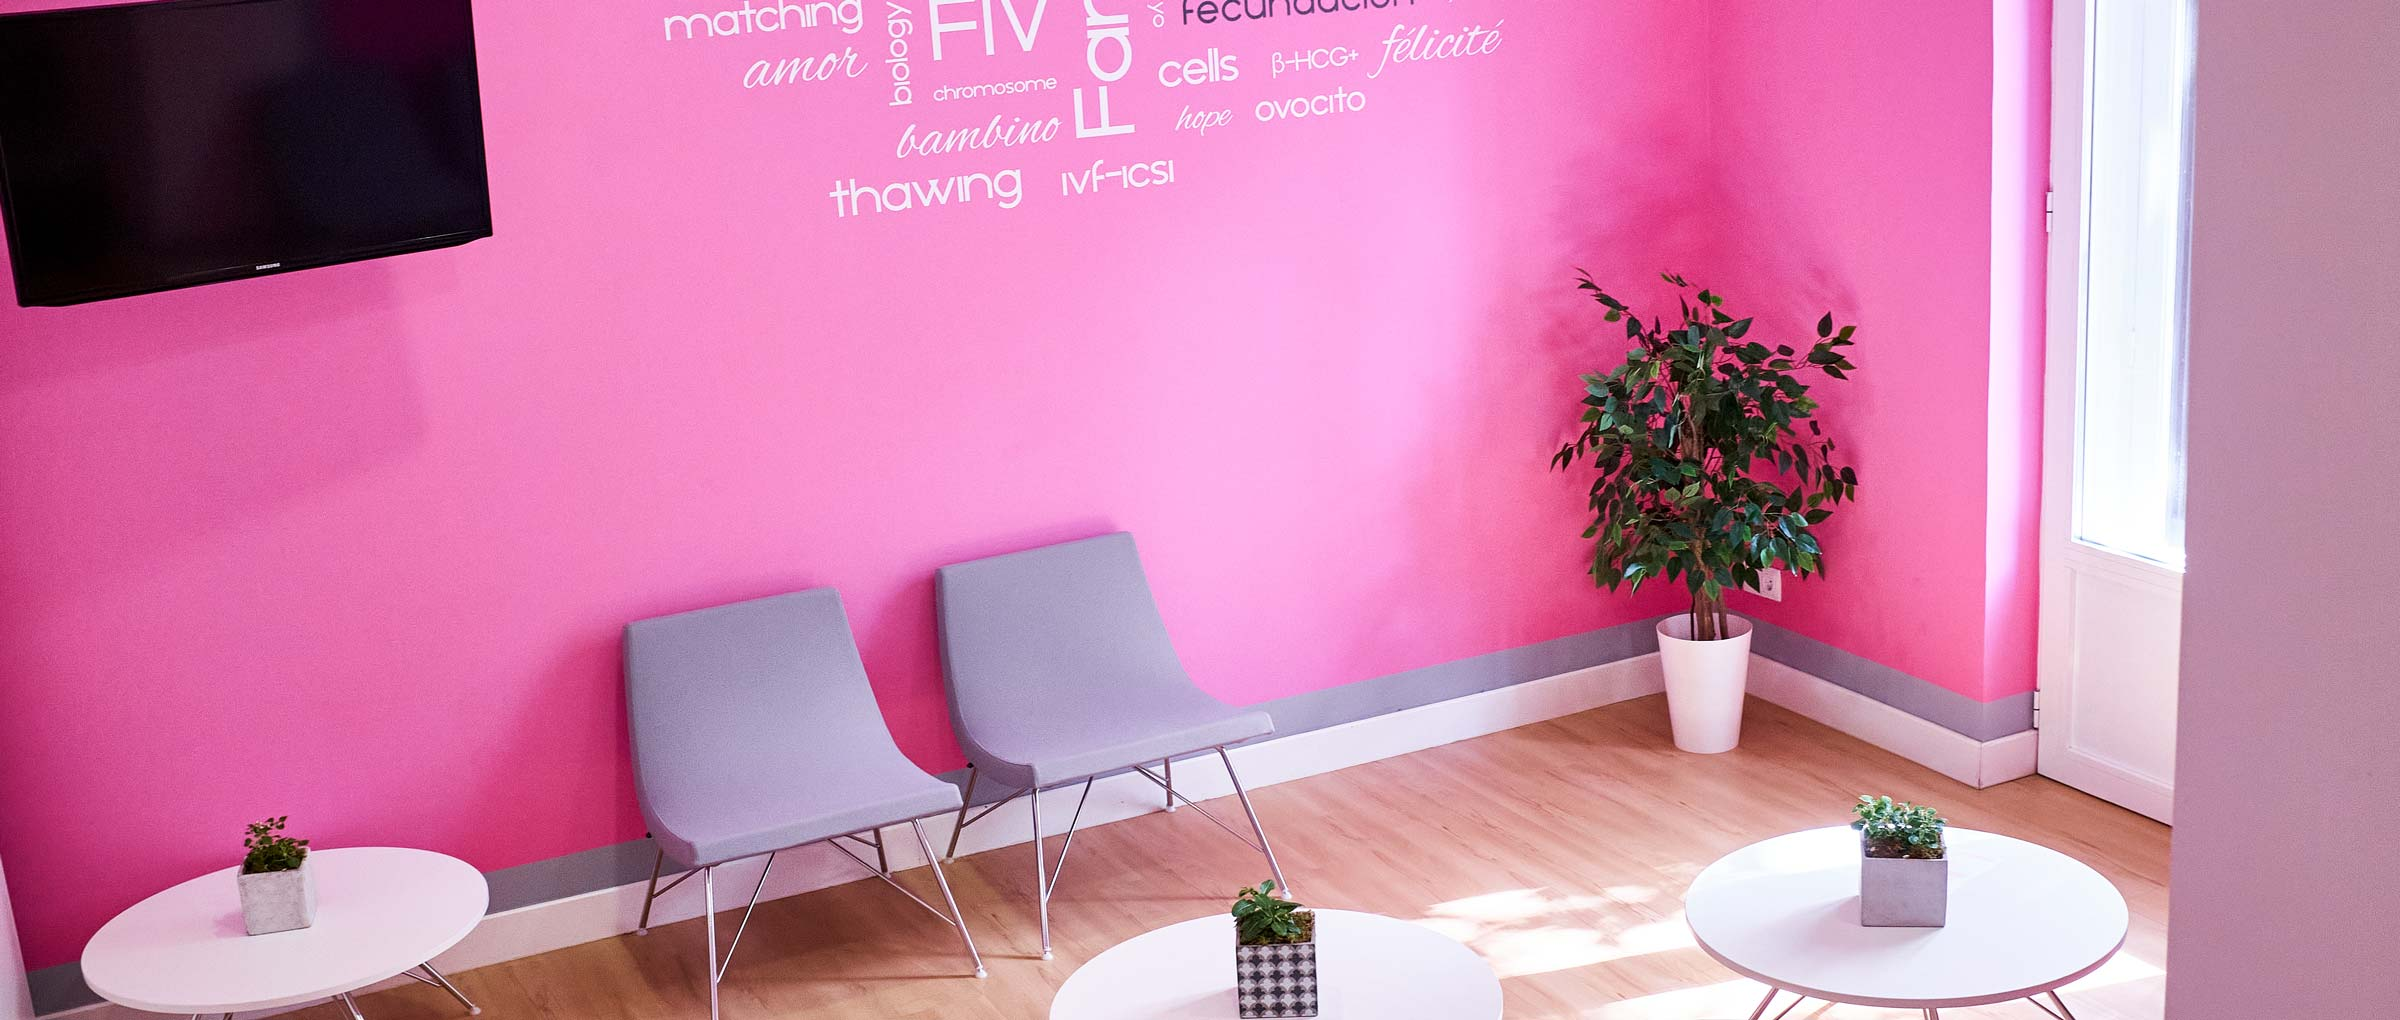 Sala de espera de Love Fertility